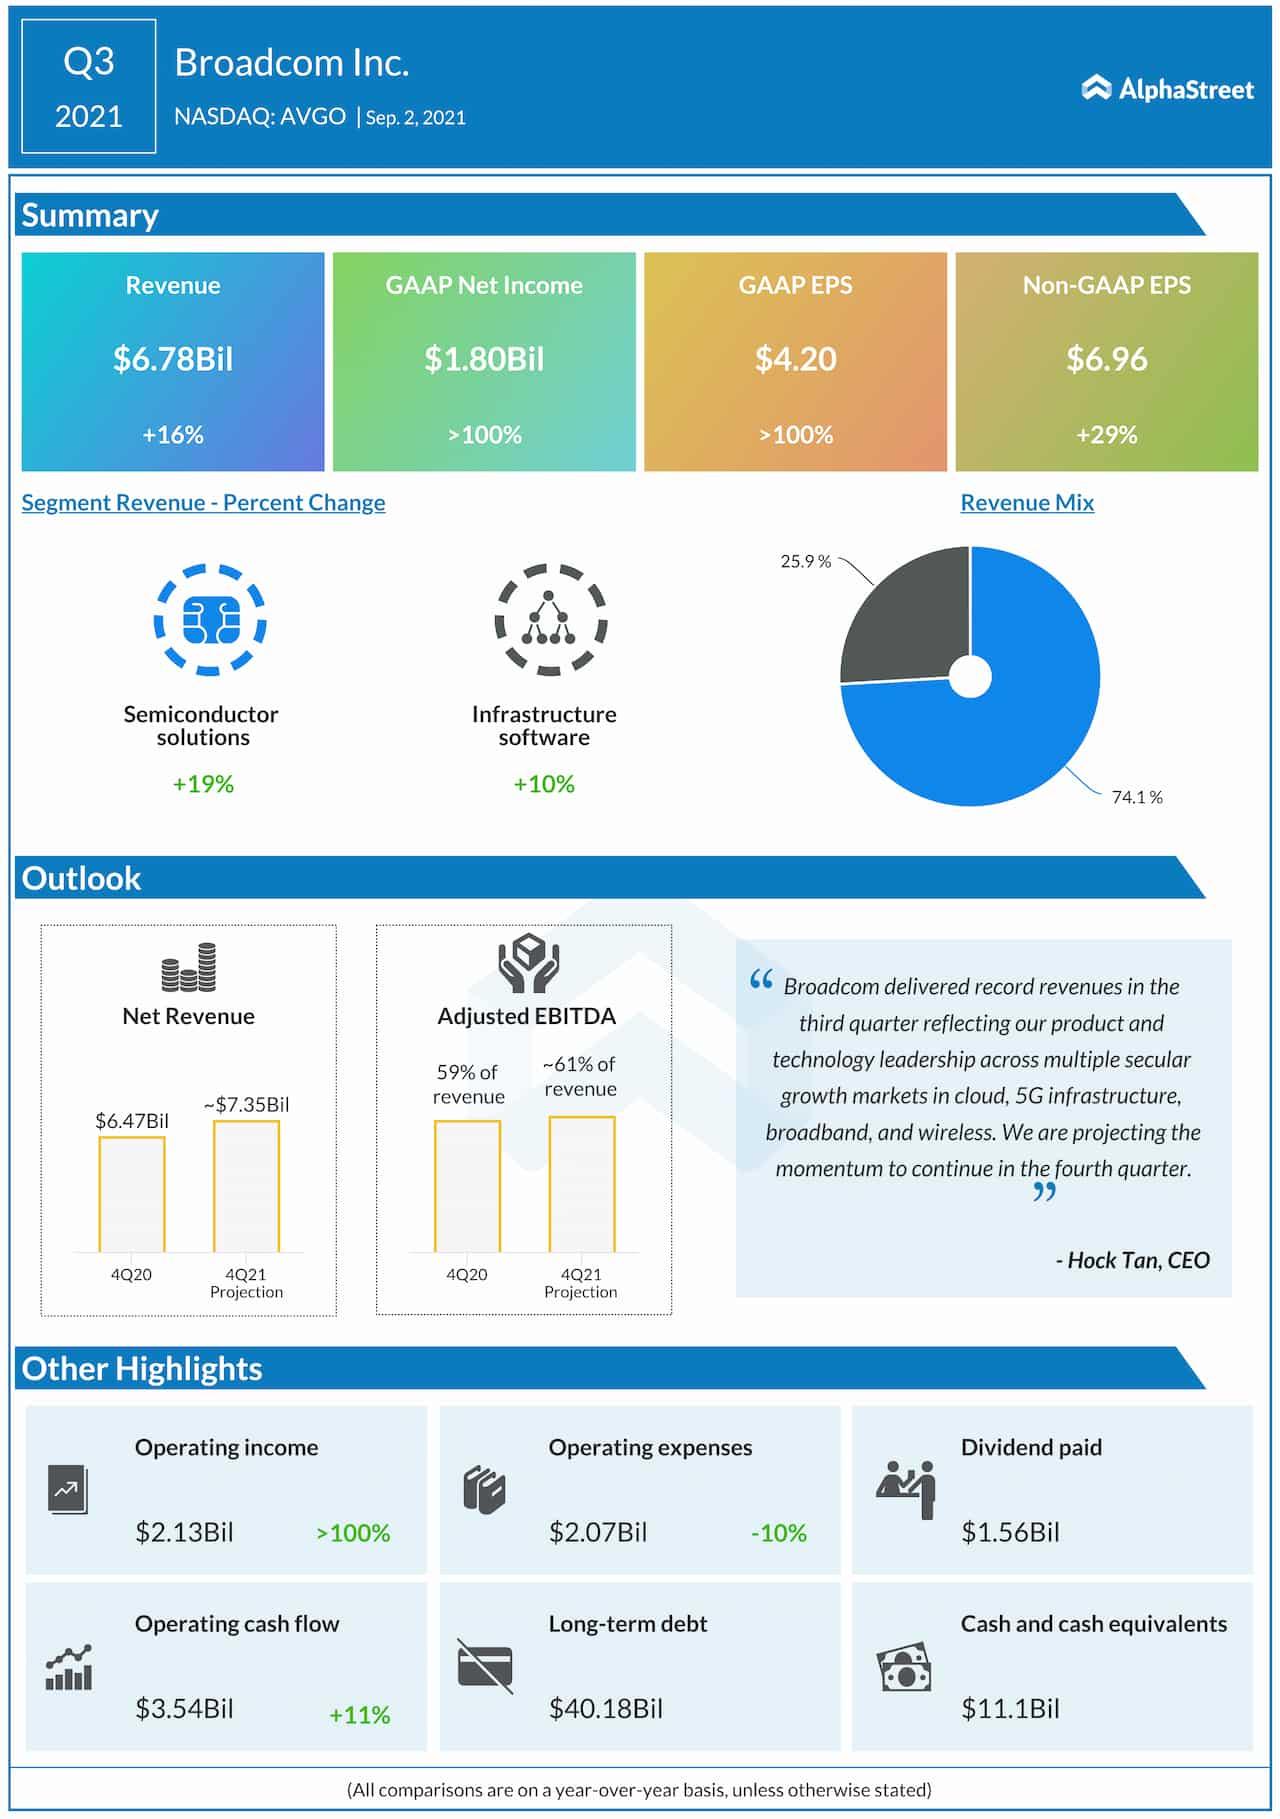 Broadcom Q3 2021 earnings infographic